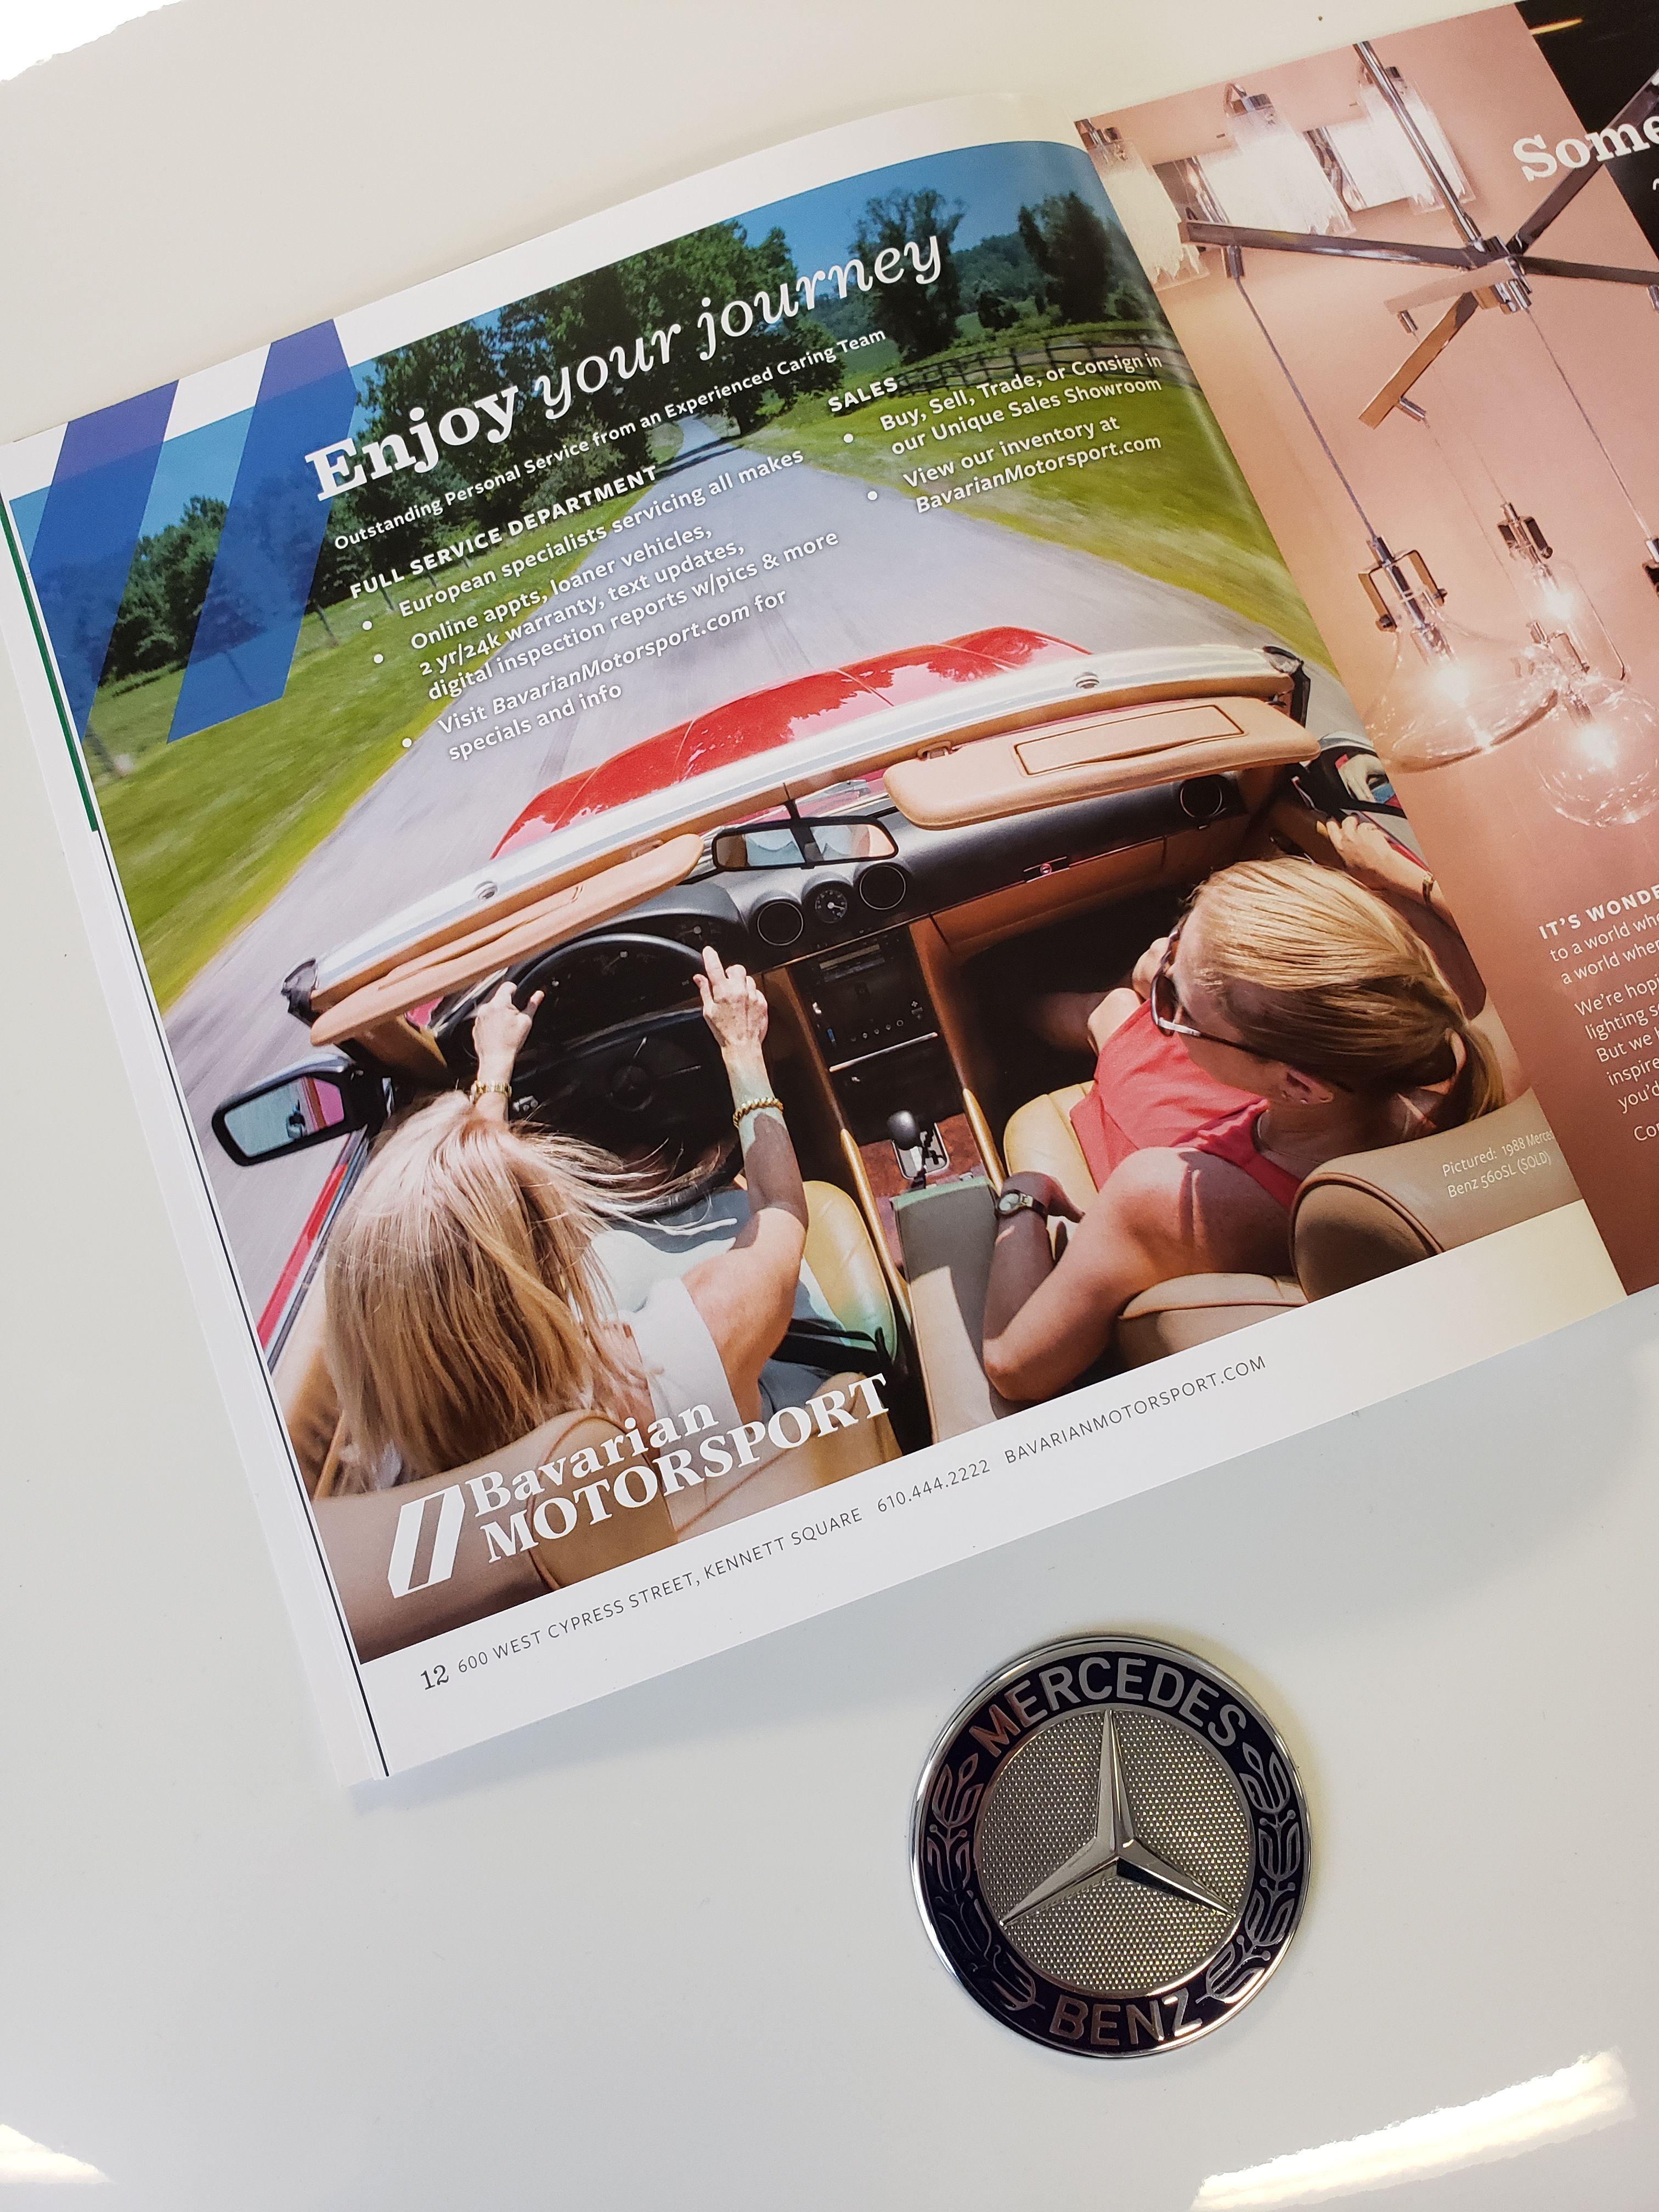 Magazine Falledition Fallseason Fallad Bavarianmotorsport Mercedesbenz Convertible Advertisement Ken Auto Service Repair And Maintenance Mercedes Benz